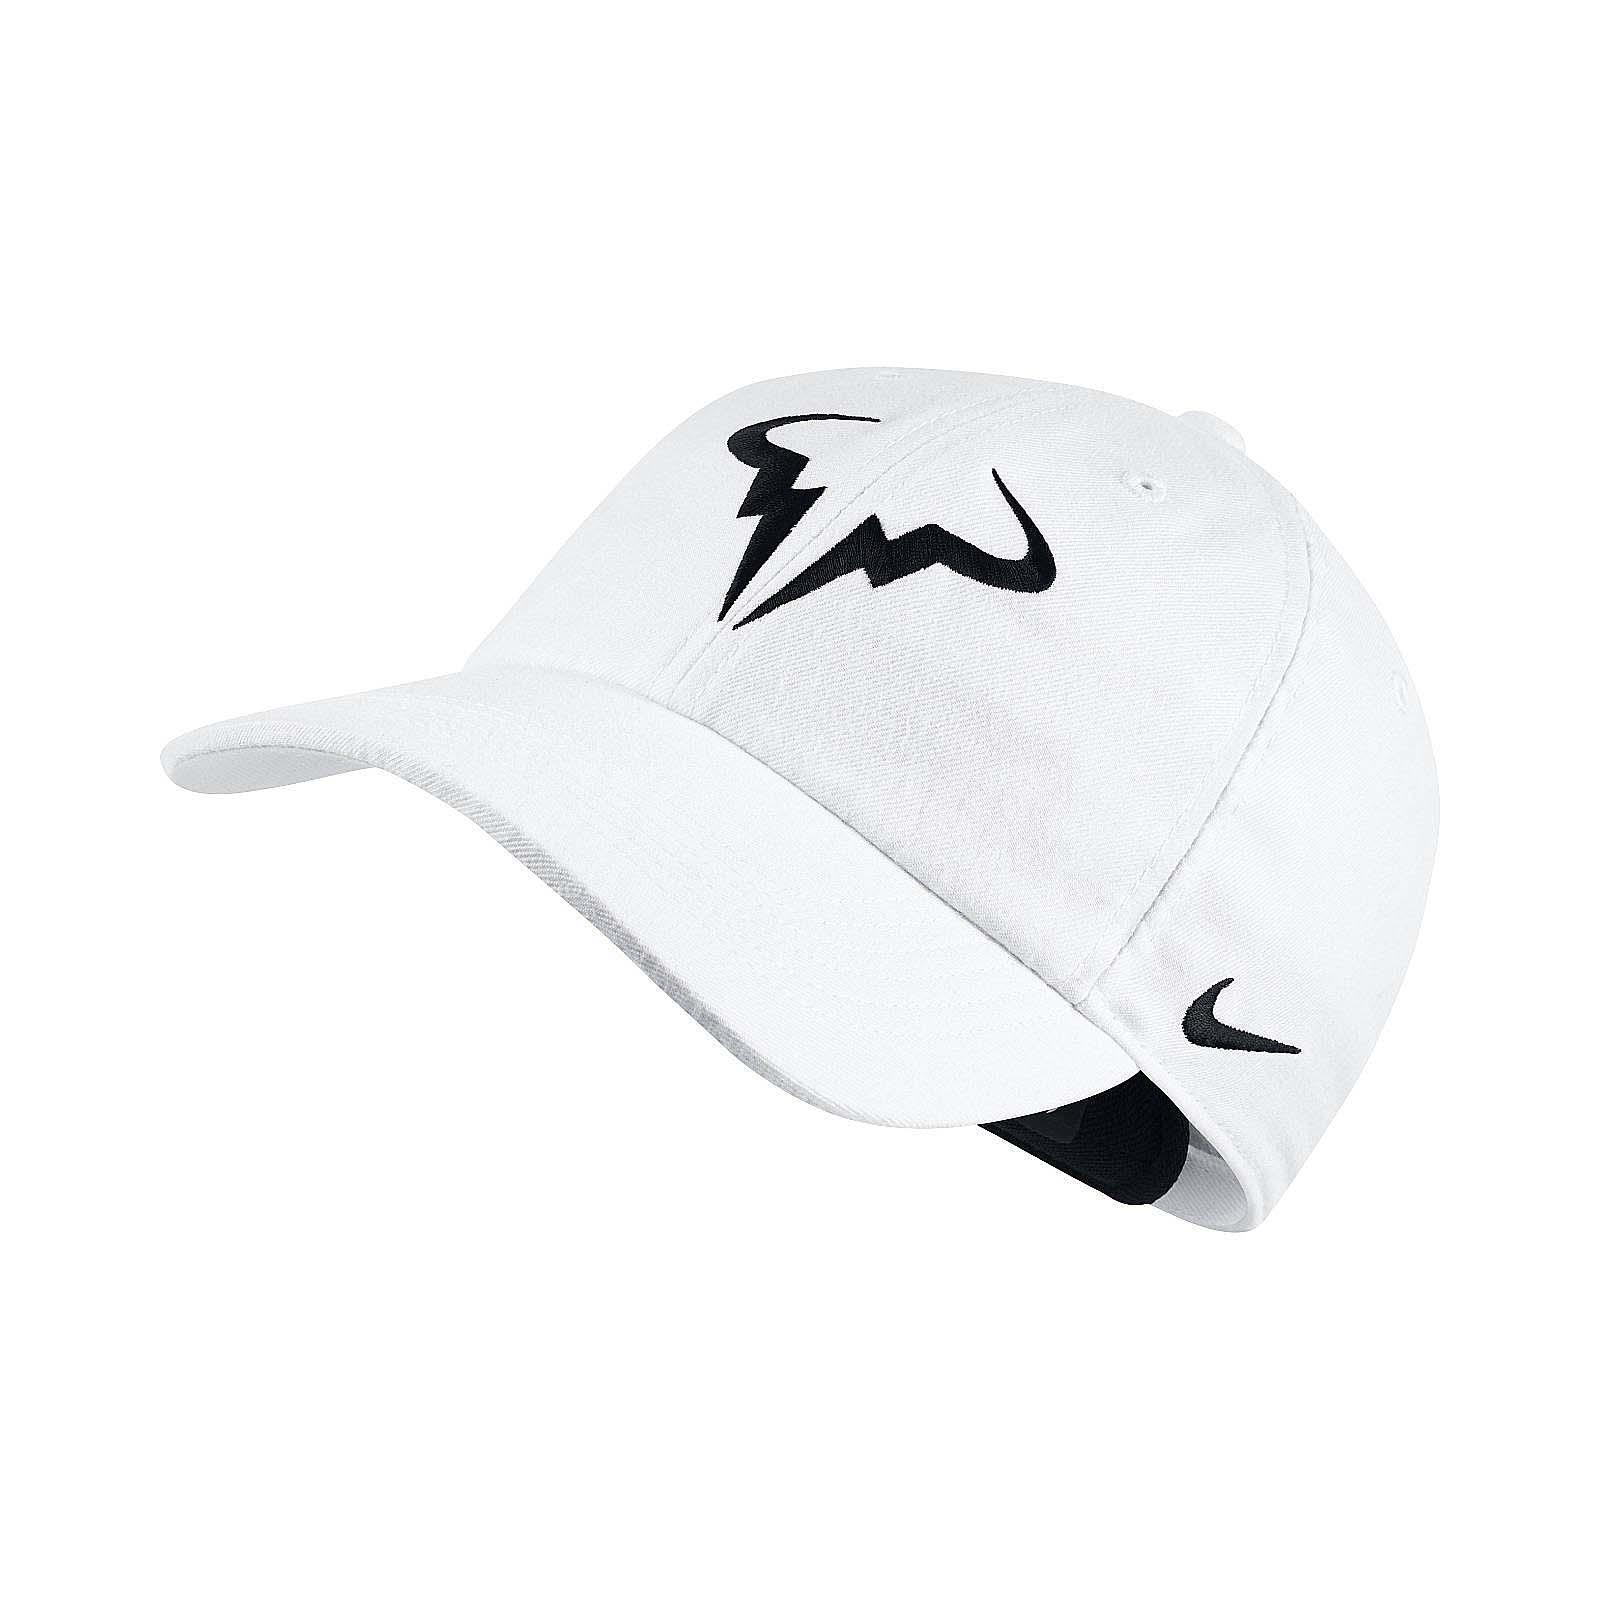 e59f507b5 Details about Nike Men Rafa Arobill H86 Cap Rafael Nadal Tennis Hat White  Black 850666-101